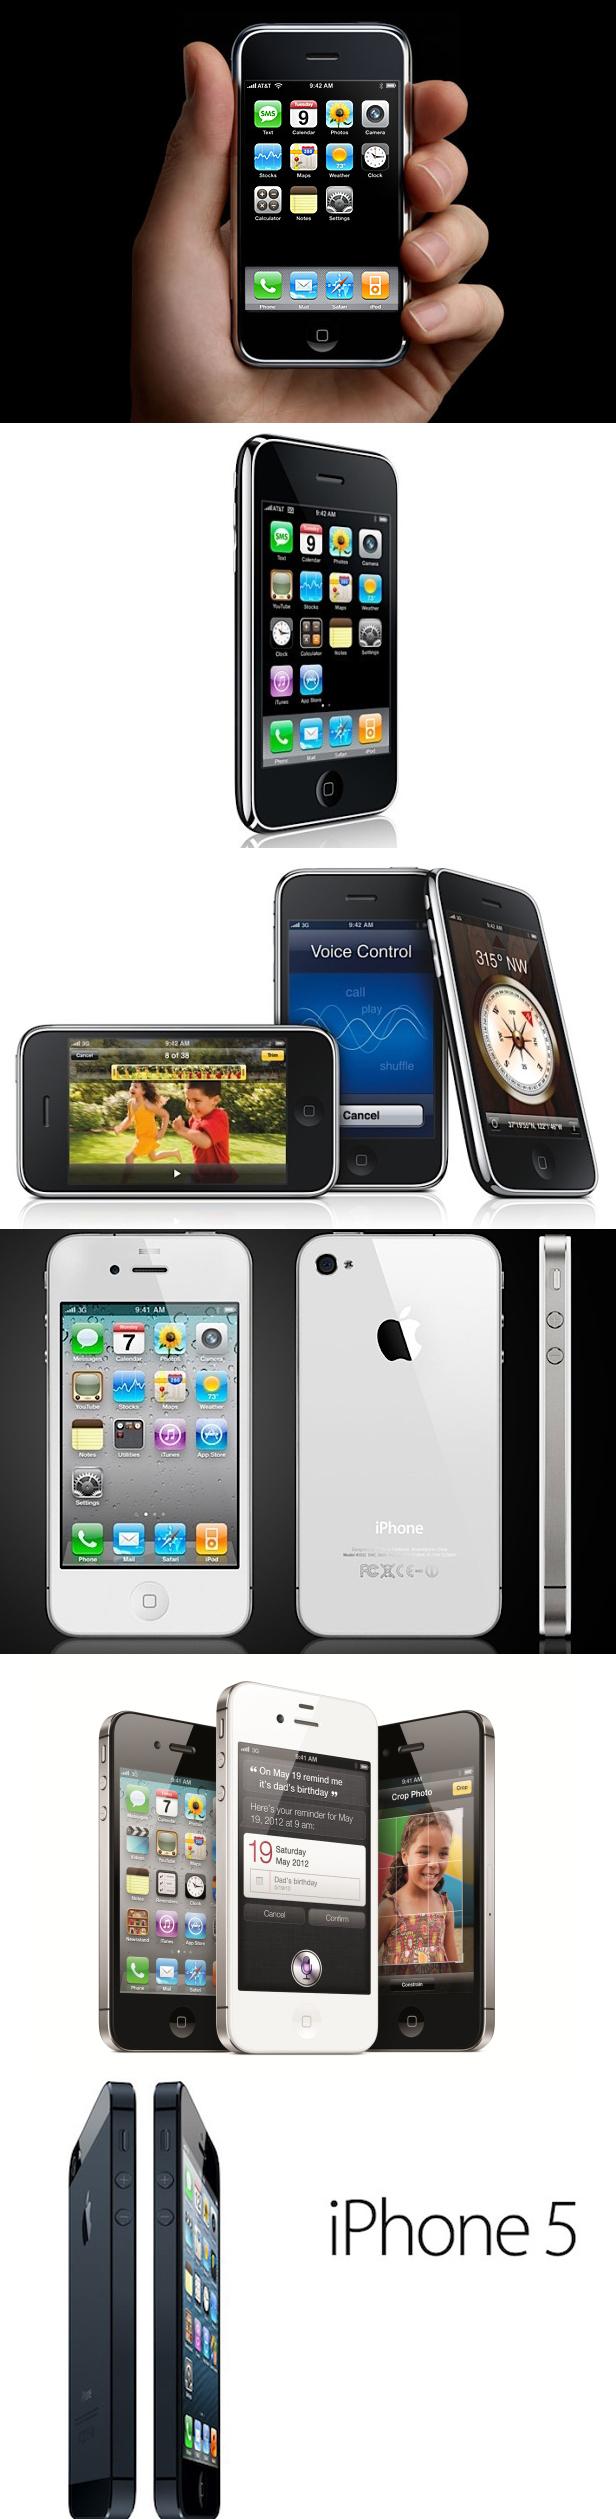 6 Generations Of IPhones